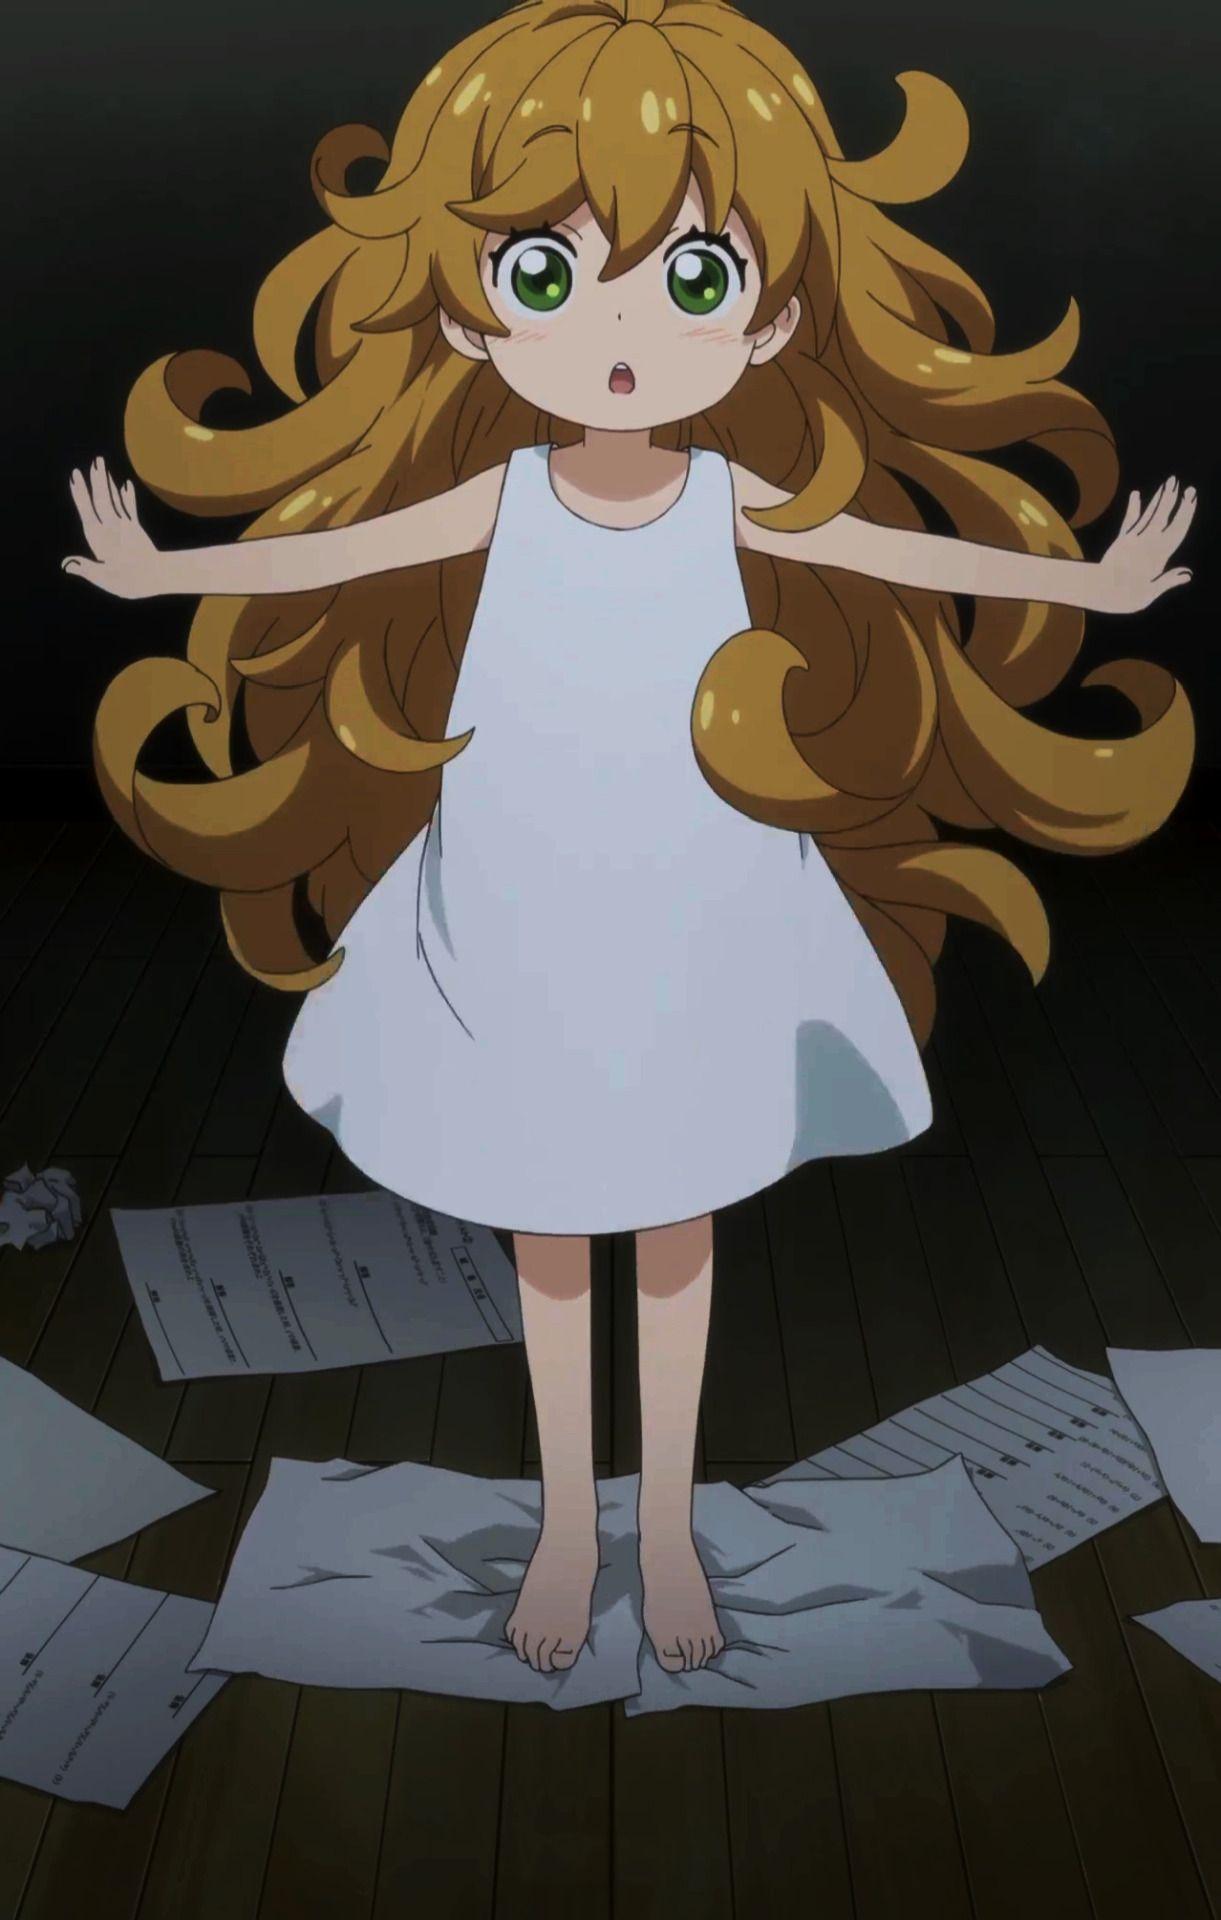 Sweetness and Lightning & Sweetness and Lightning | Anime and Manga | Pinterest | Lightning ... azcodes.com